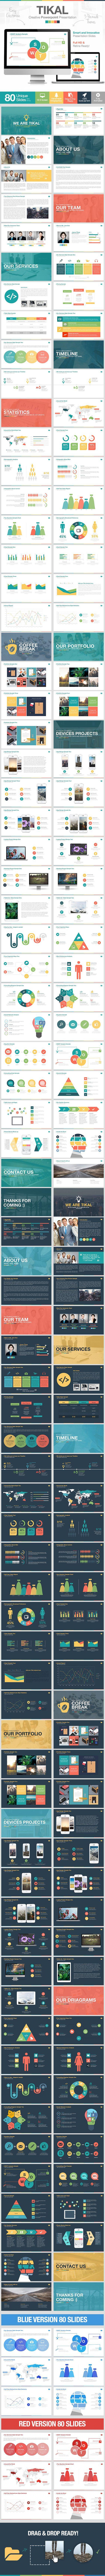 Tikal PowerPoint Presentation Template PowerPoint Template / Theme / Presentation / Slides / Background / Power Point #powerpoint #template #theme